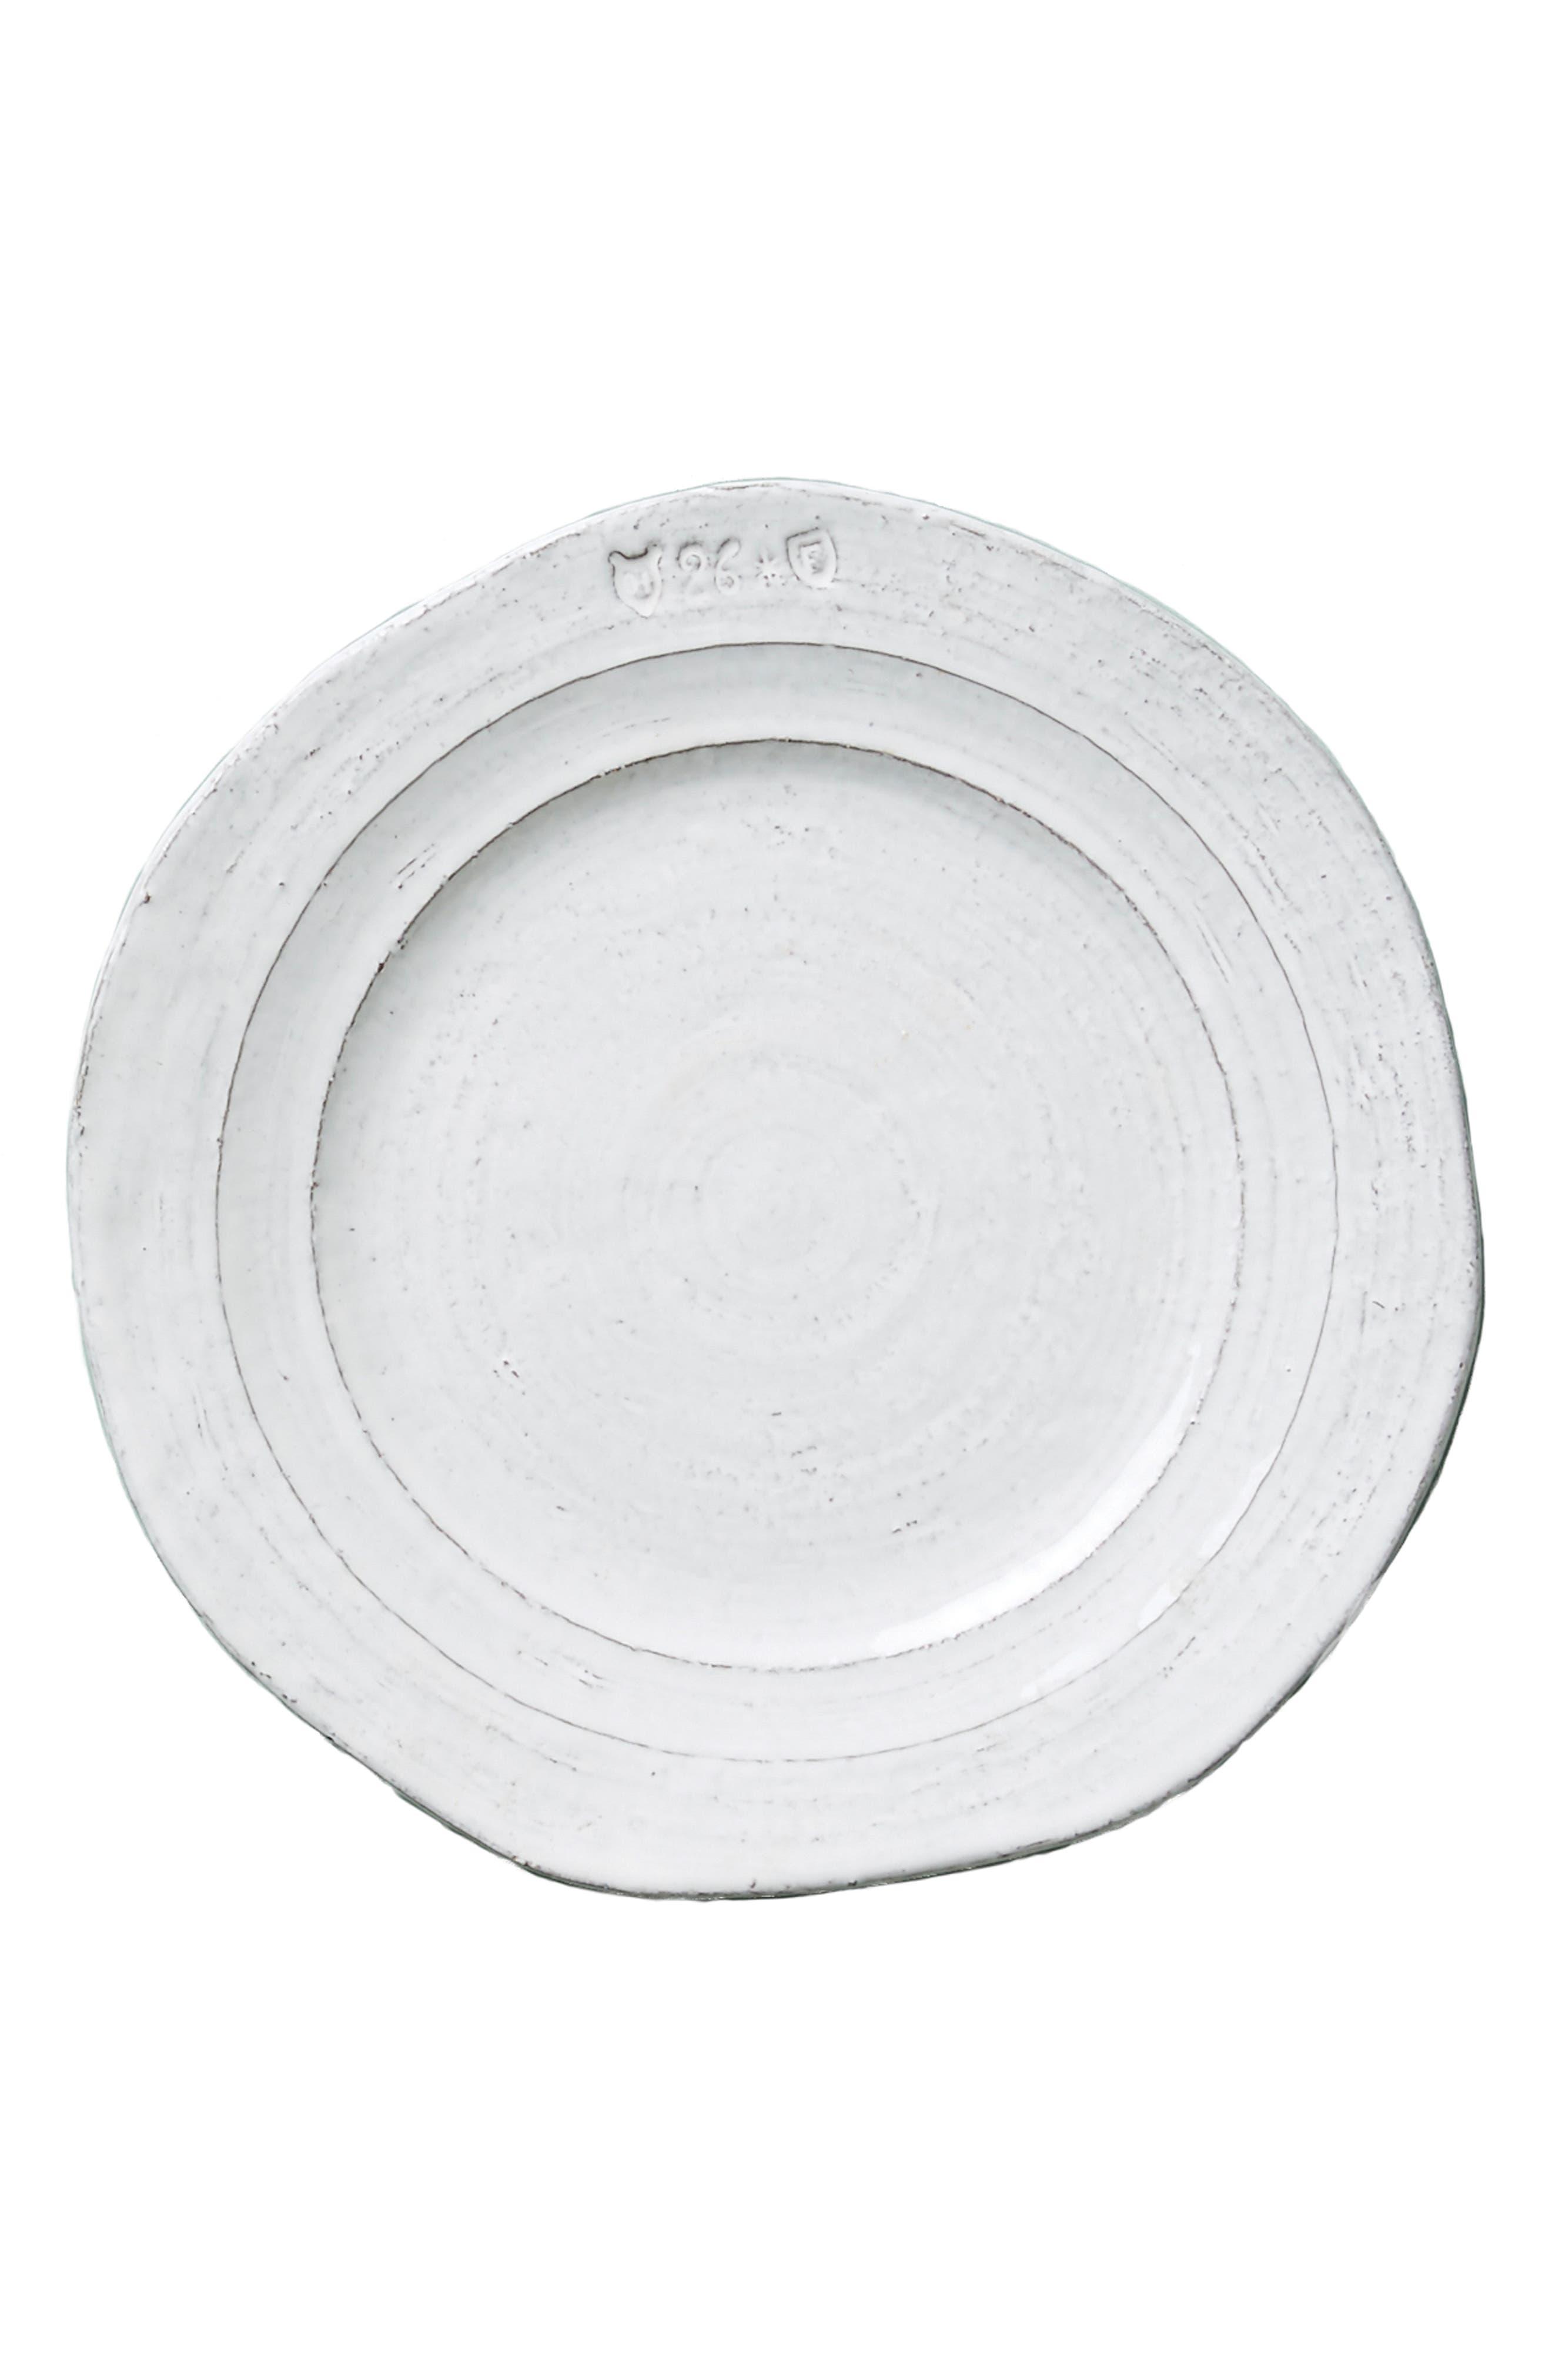 Glenna Side Plate,                             Alternate thumbnail 2, color,                             105